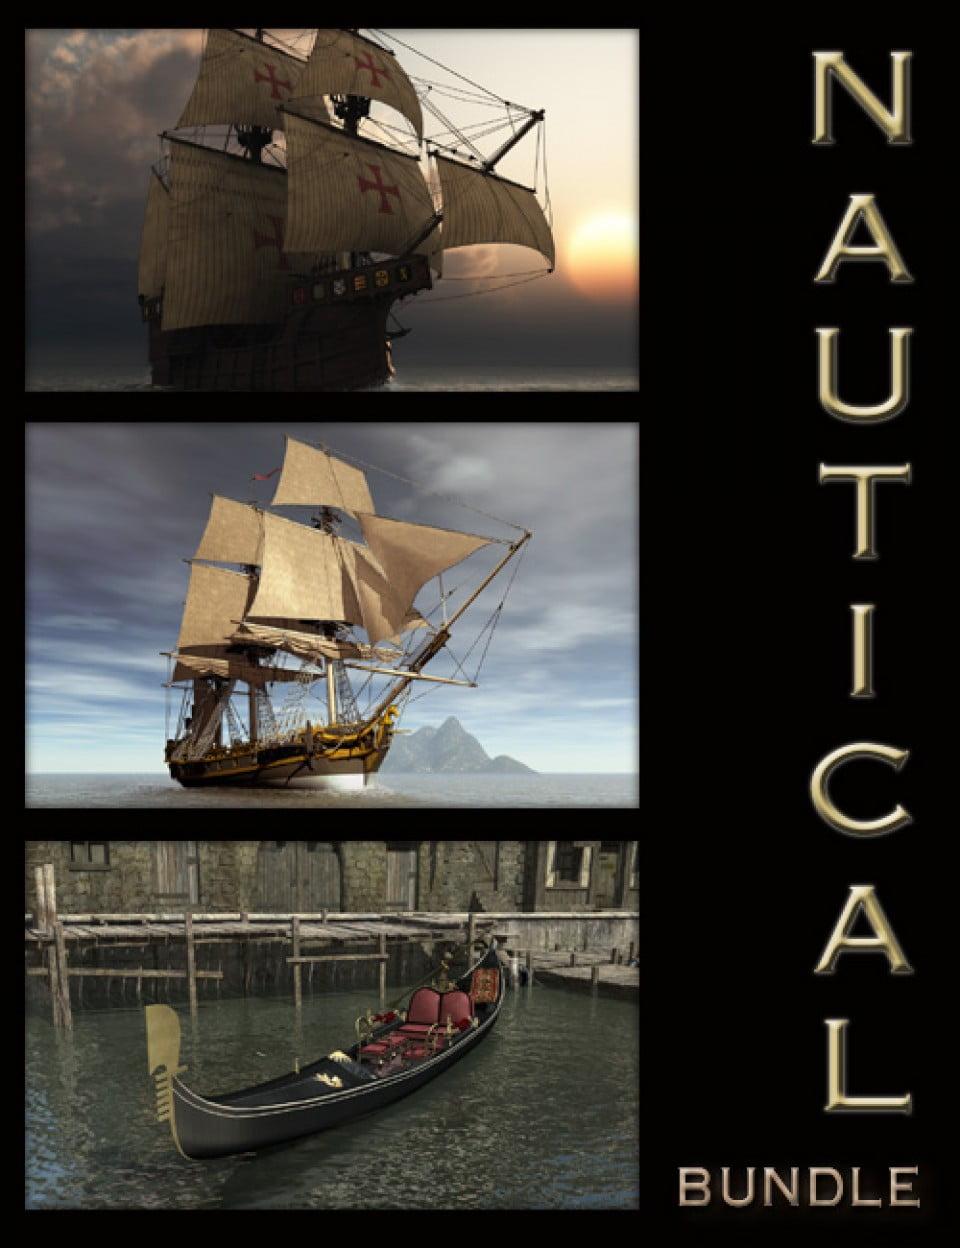 The Faveral Nautical Bundle